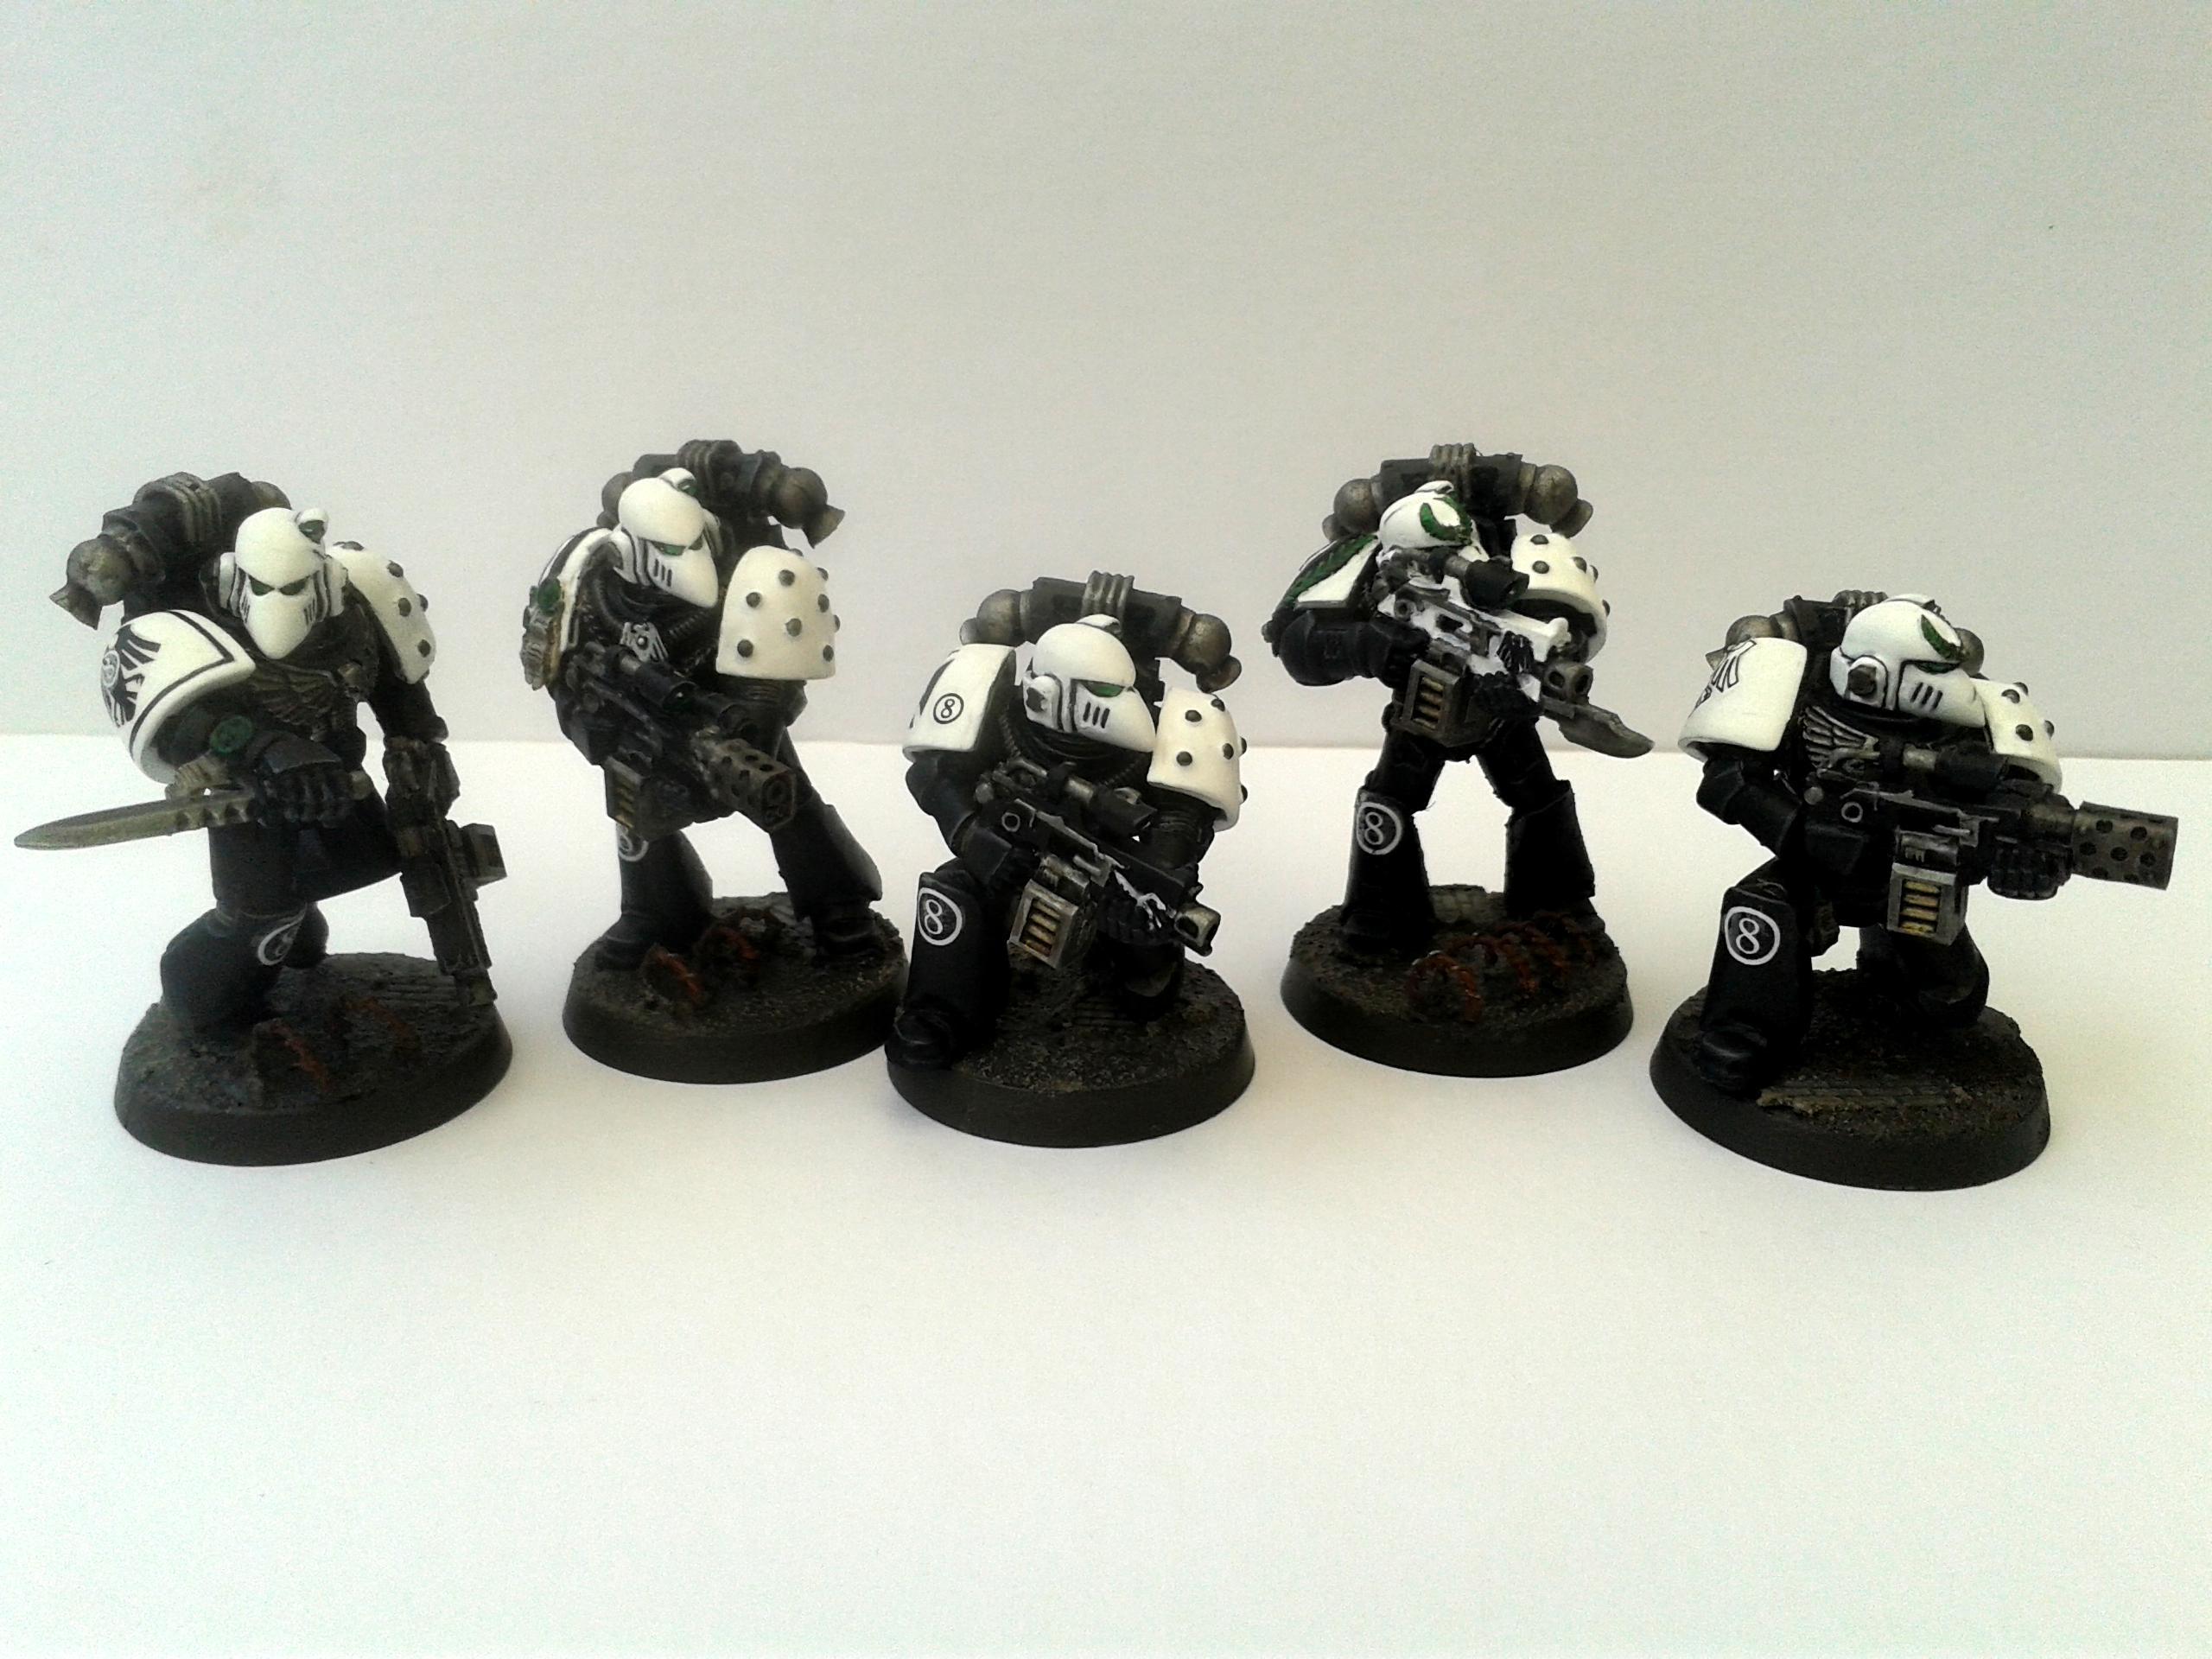 Armor, Combi, Combi-flamer, Corvus, Flamer, Guard, Hammer, Mkvi, Raven, Space, Space Marines, Sternguard, Veteran, War, Warhammer 40,000, Warhammer Fantasy, Weapon